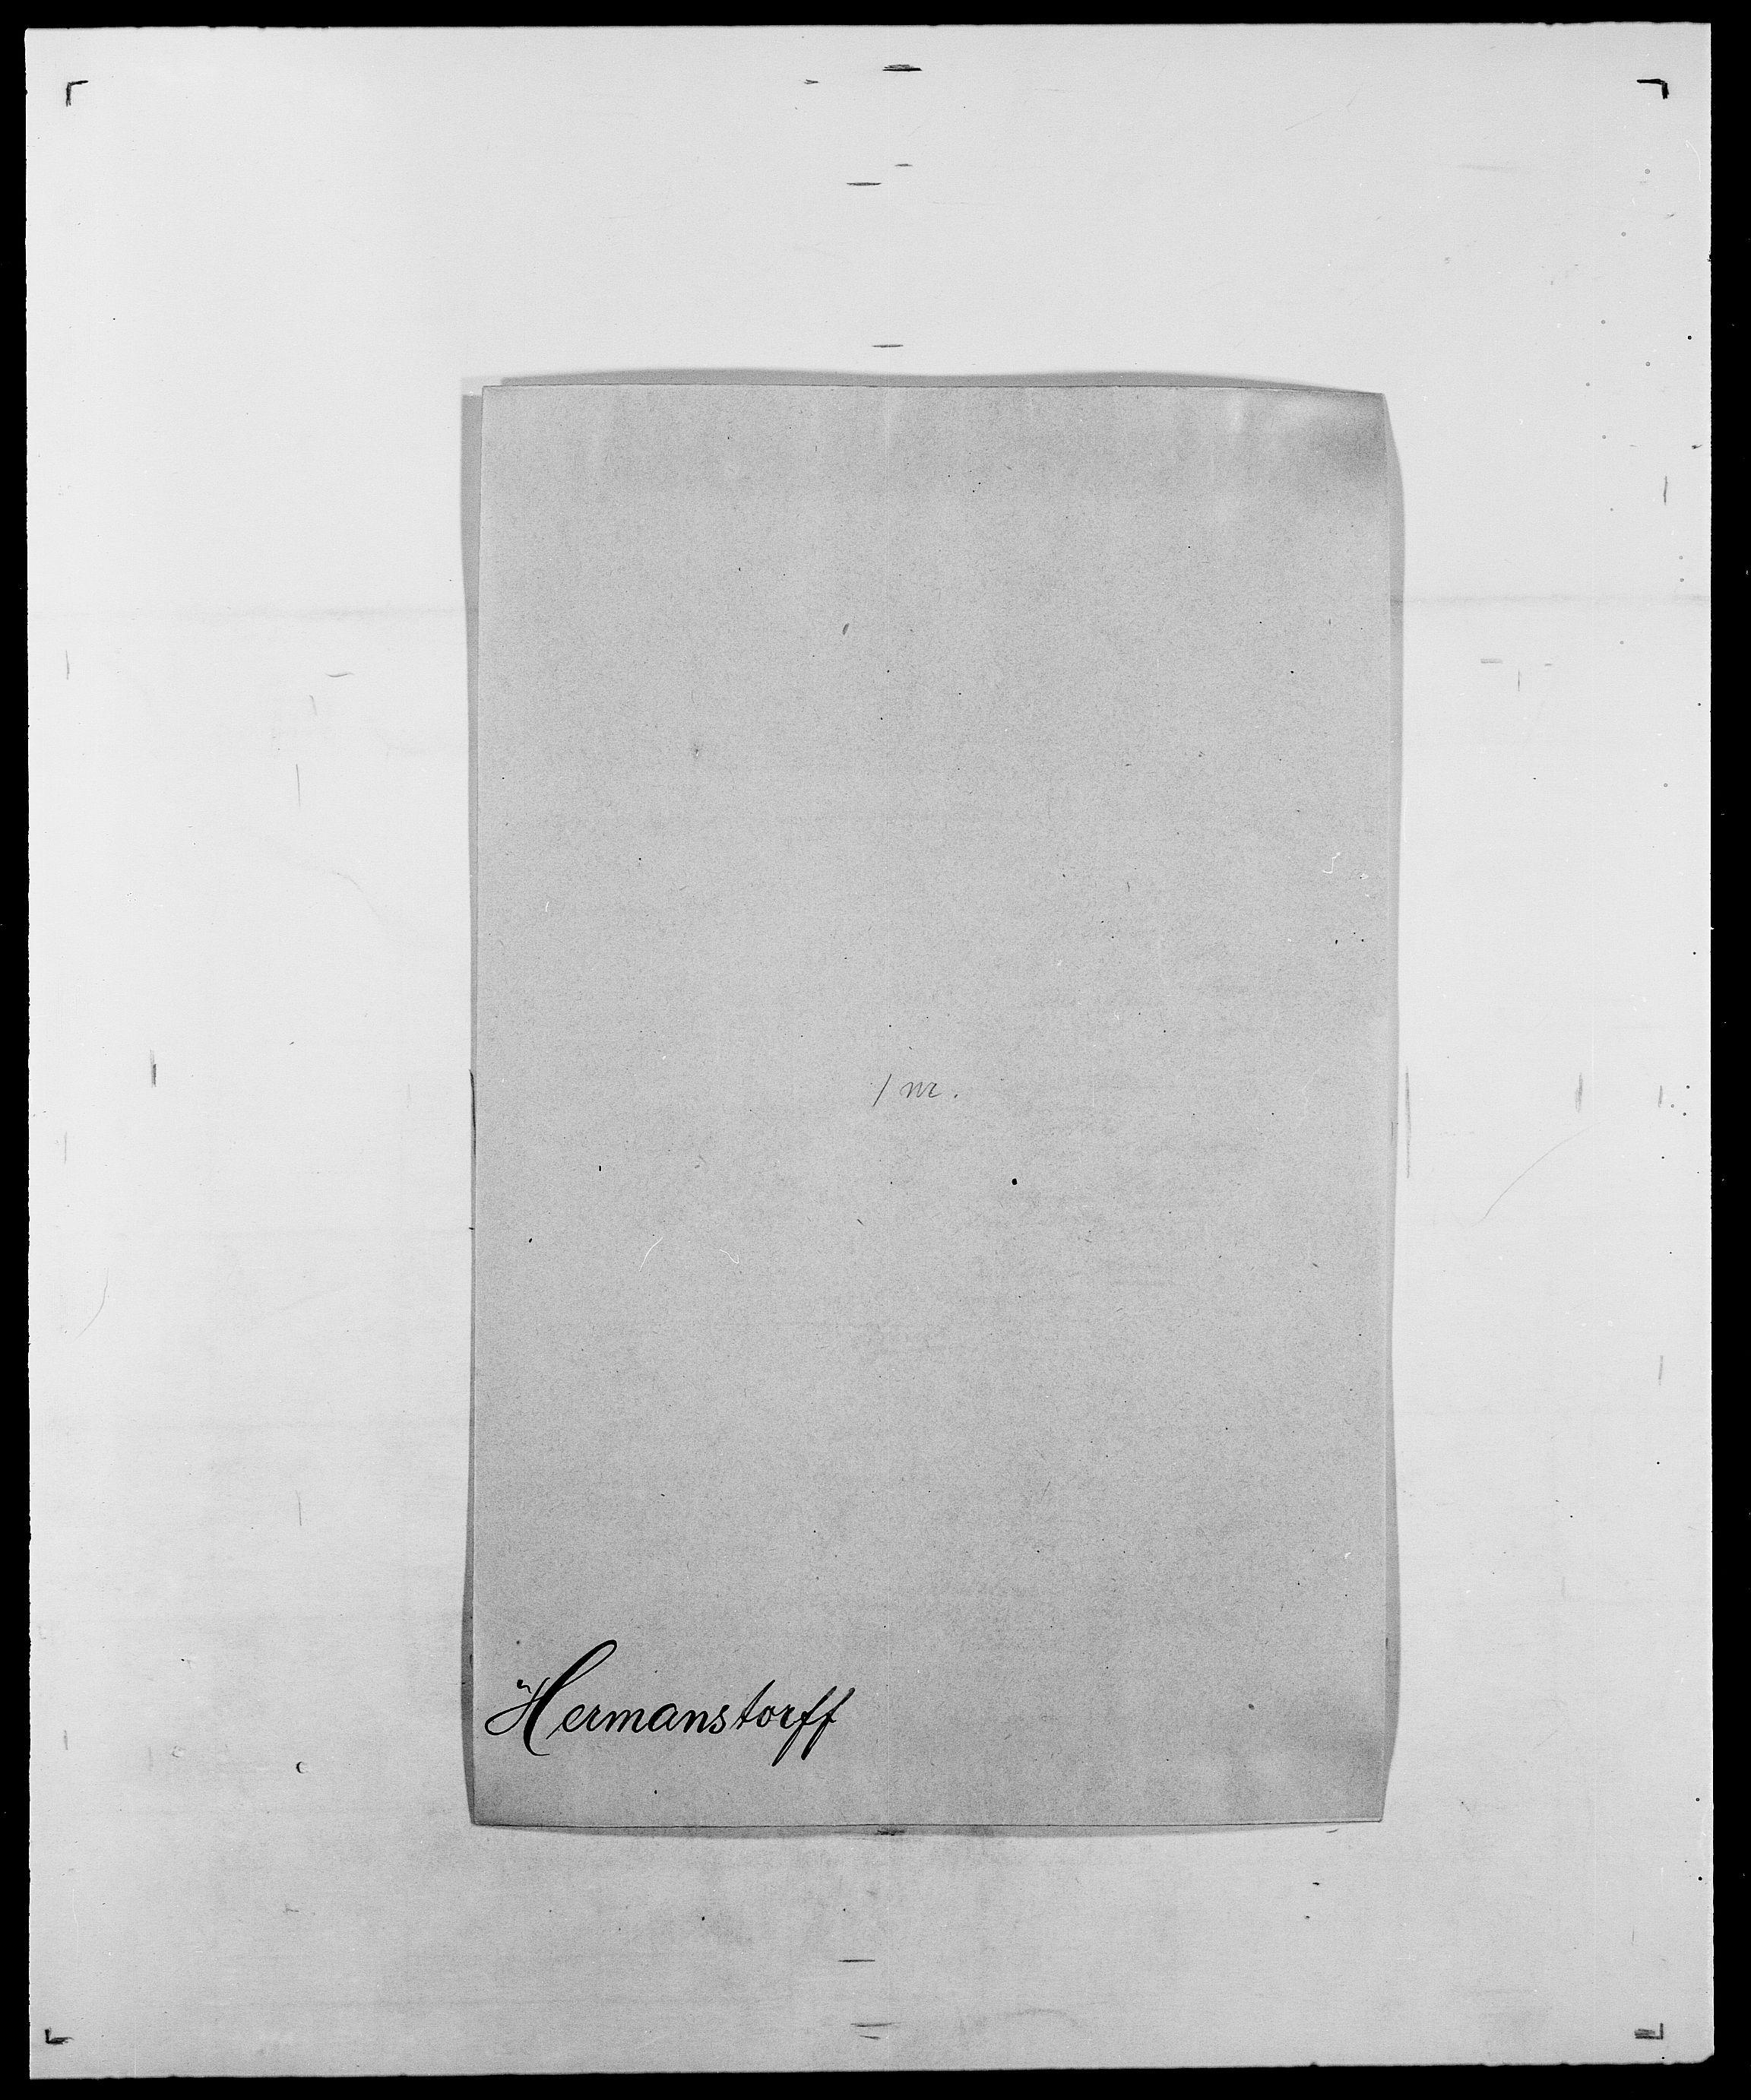 SAO, Delgobe, Charles Antoine - samling, D/Da/L0017: Helander - Hjørne, s. 252